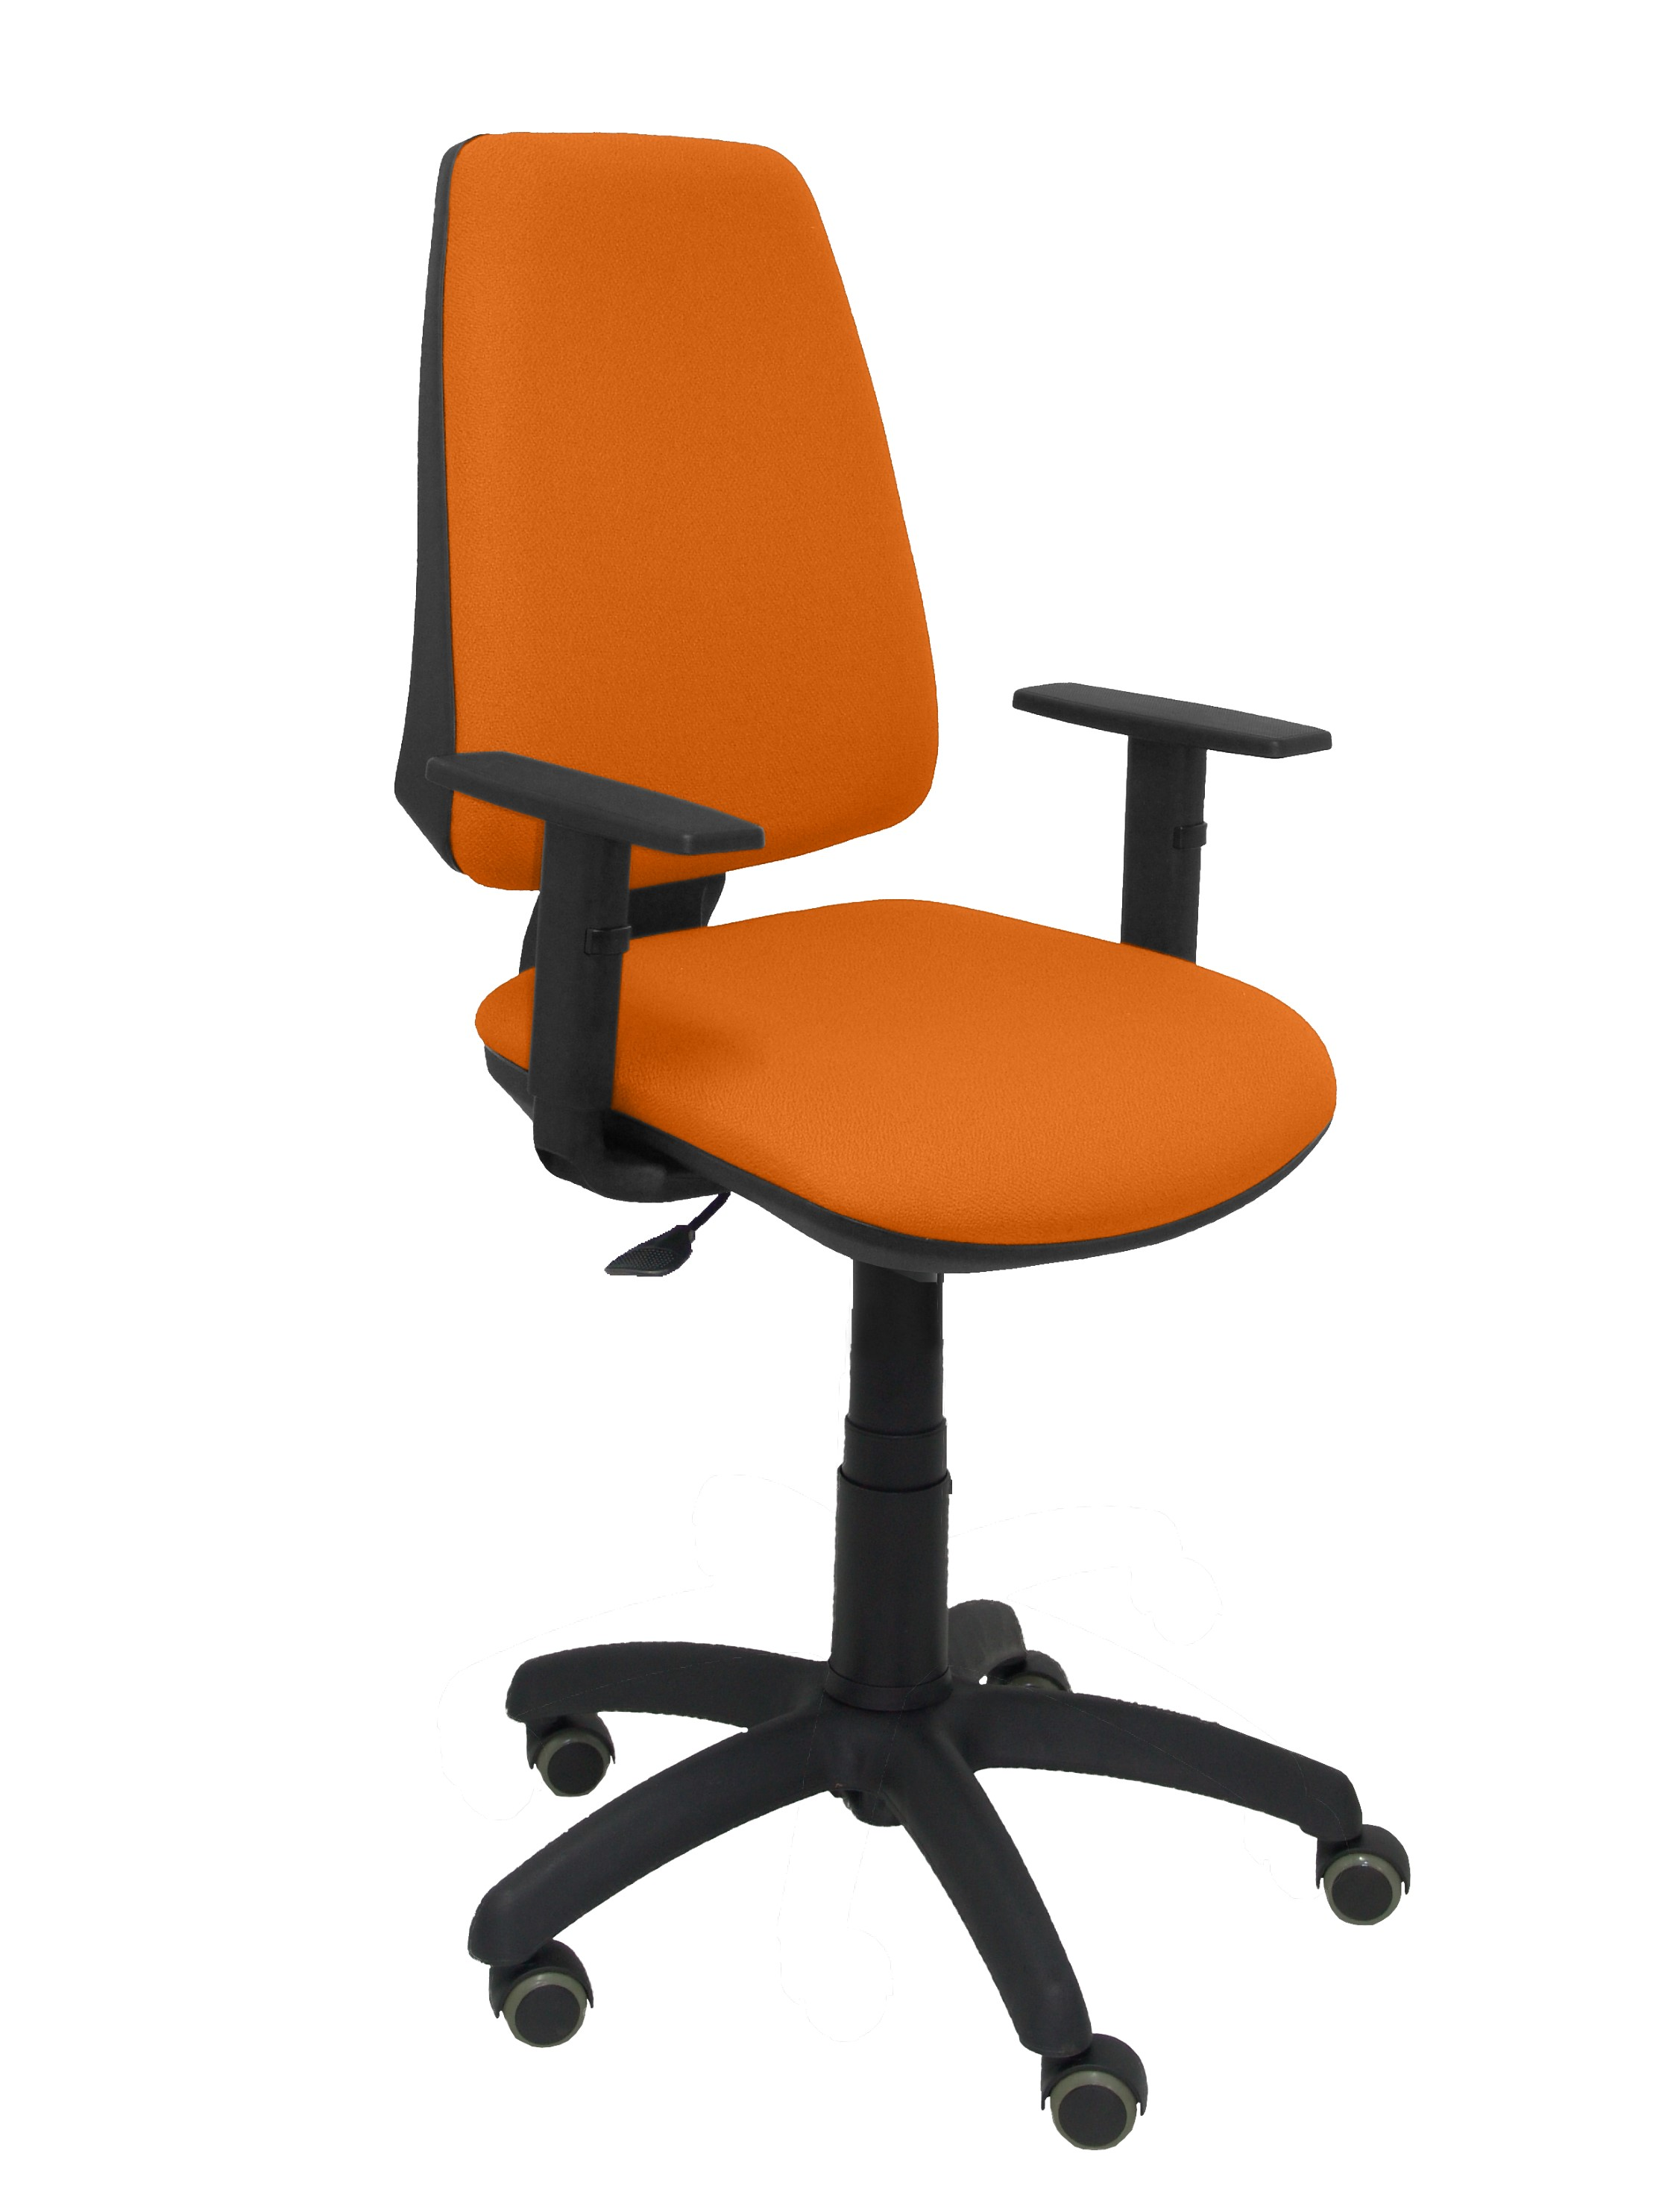 Silla Elche CP bali naranja brazos regulables ruedas de parquet